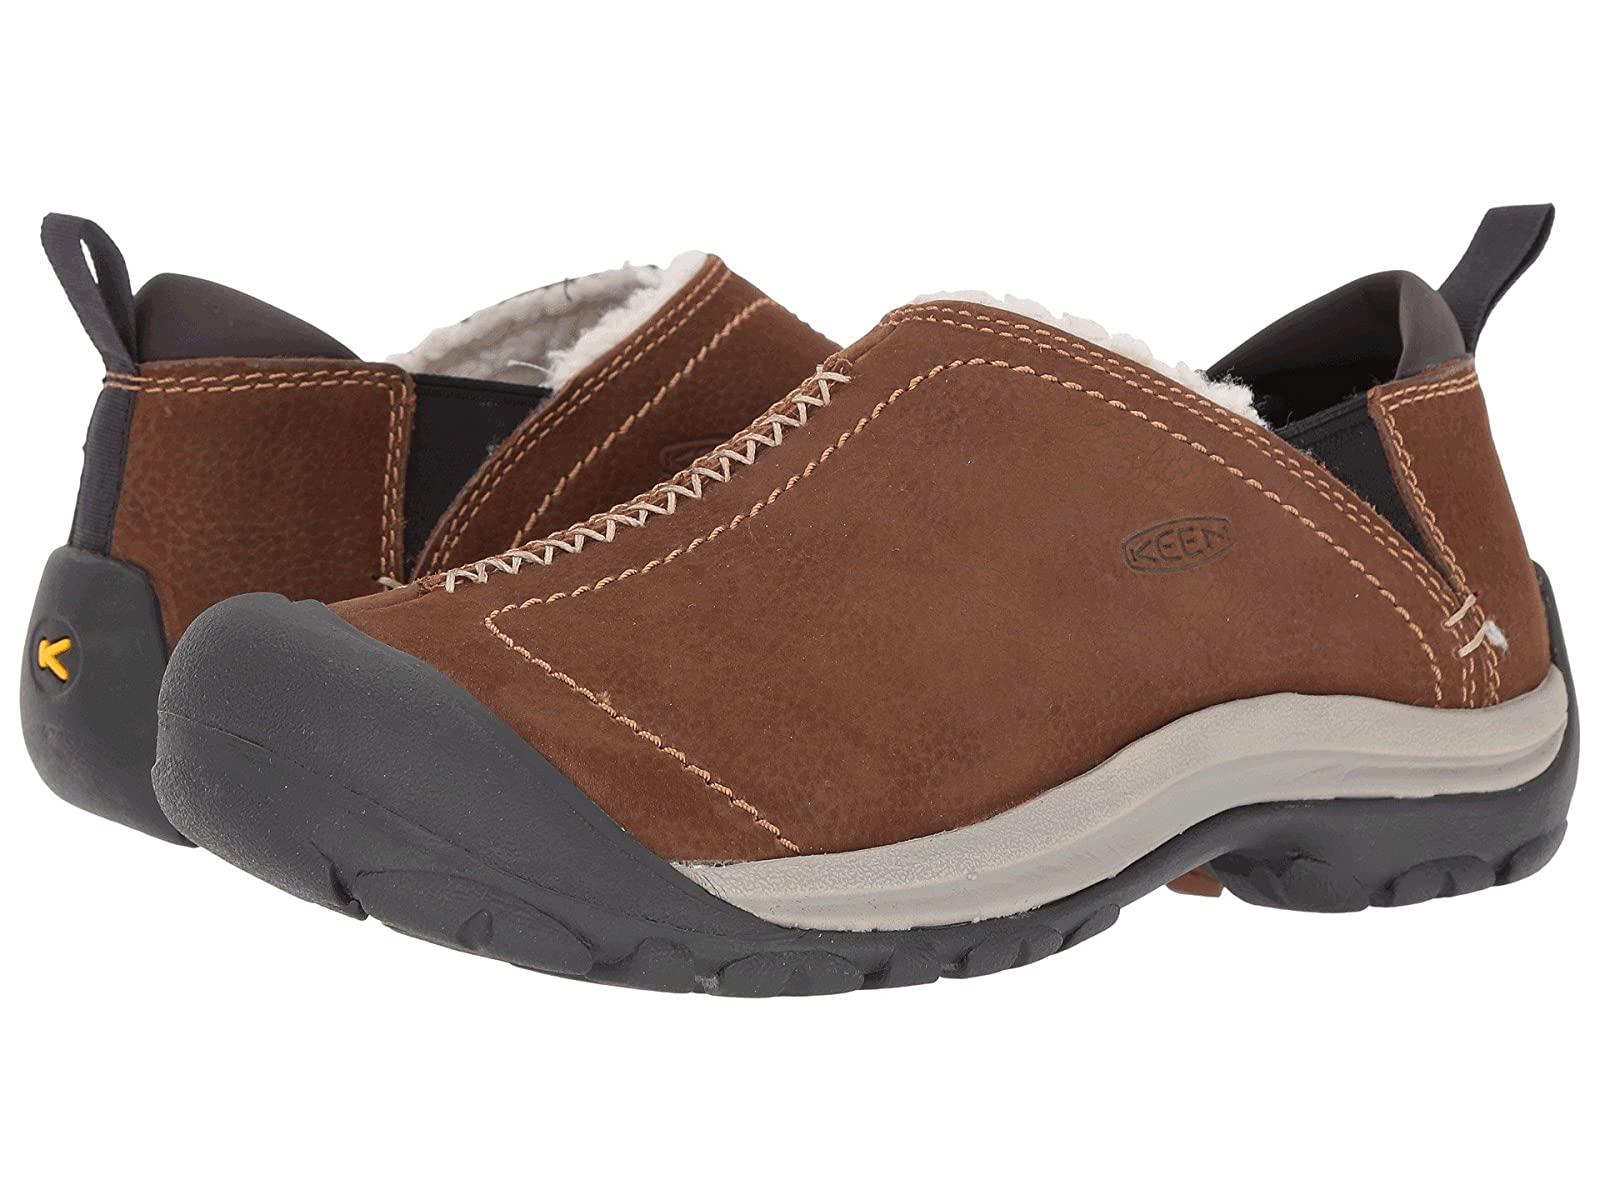 Keen Kaci WinterCheap and distinctive eye-catching shoes